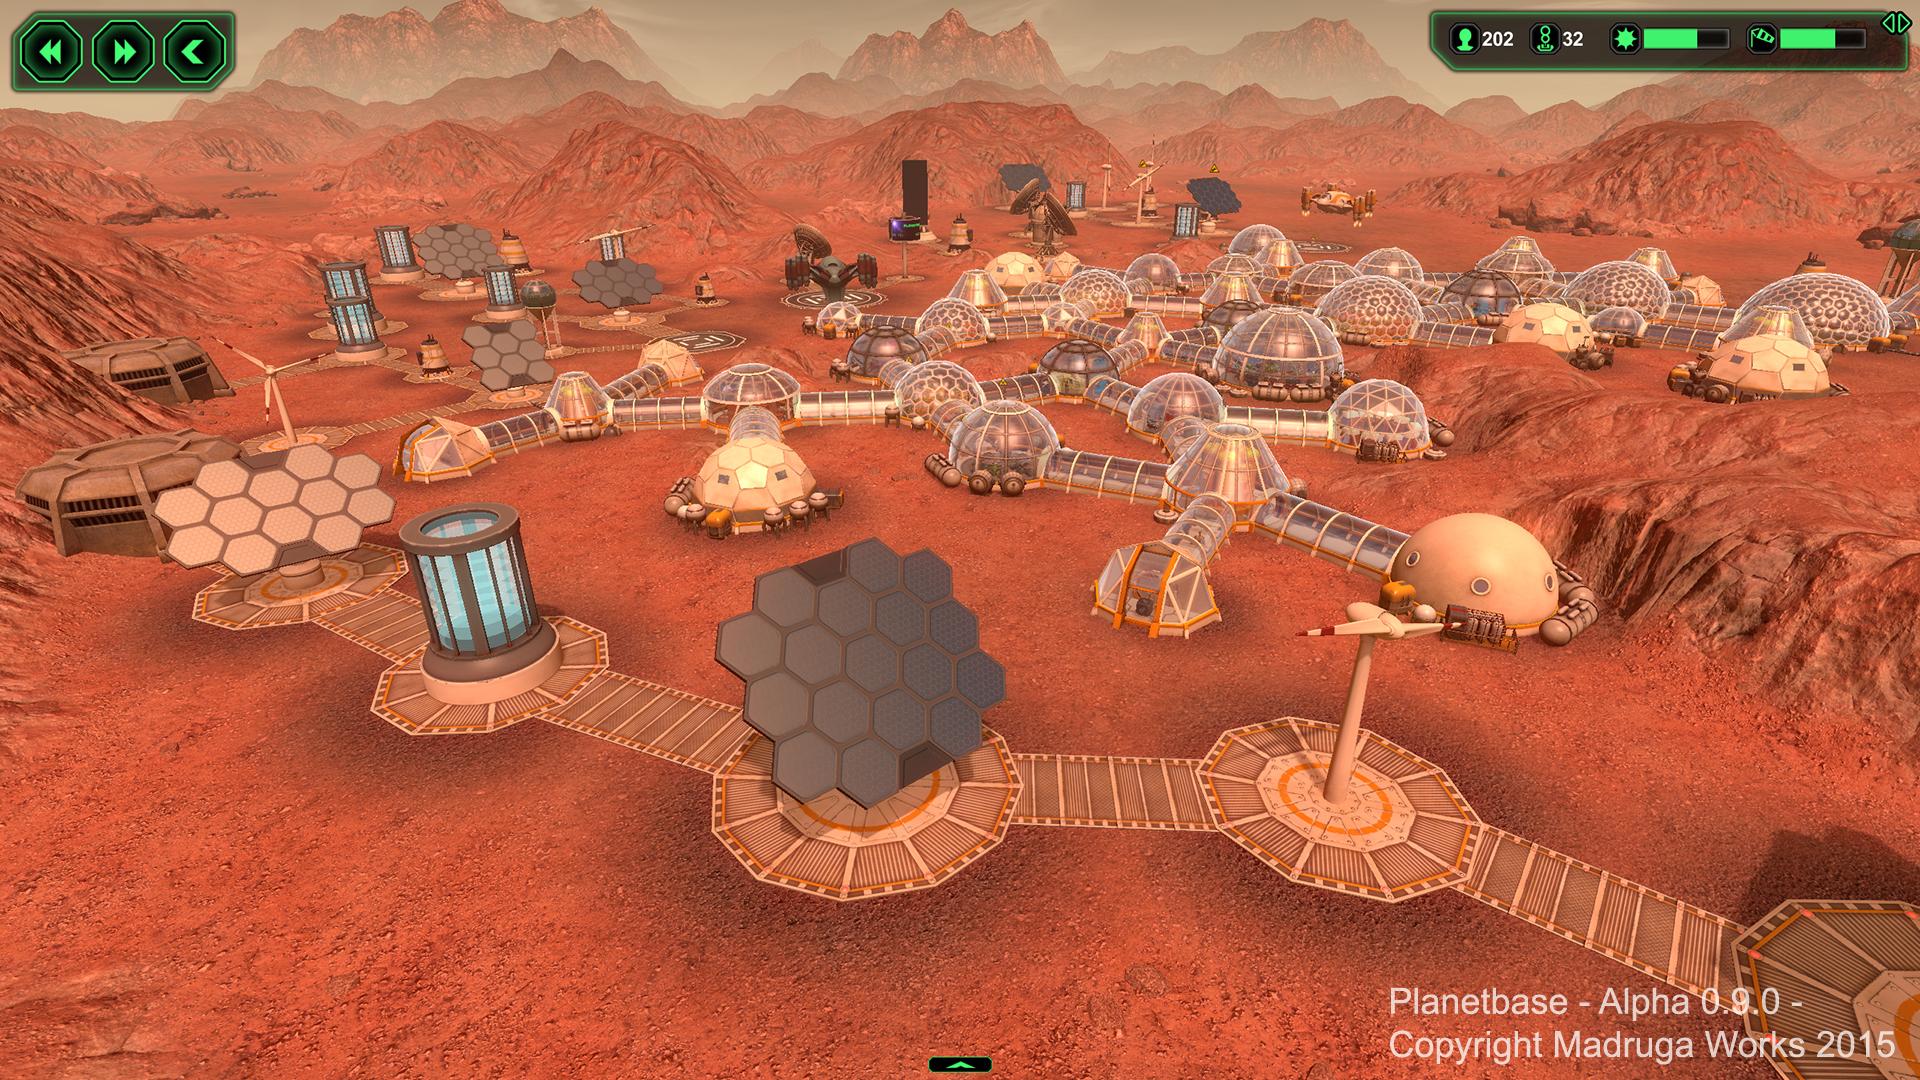 Screenshot for the game Planetbase V.1.3.7